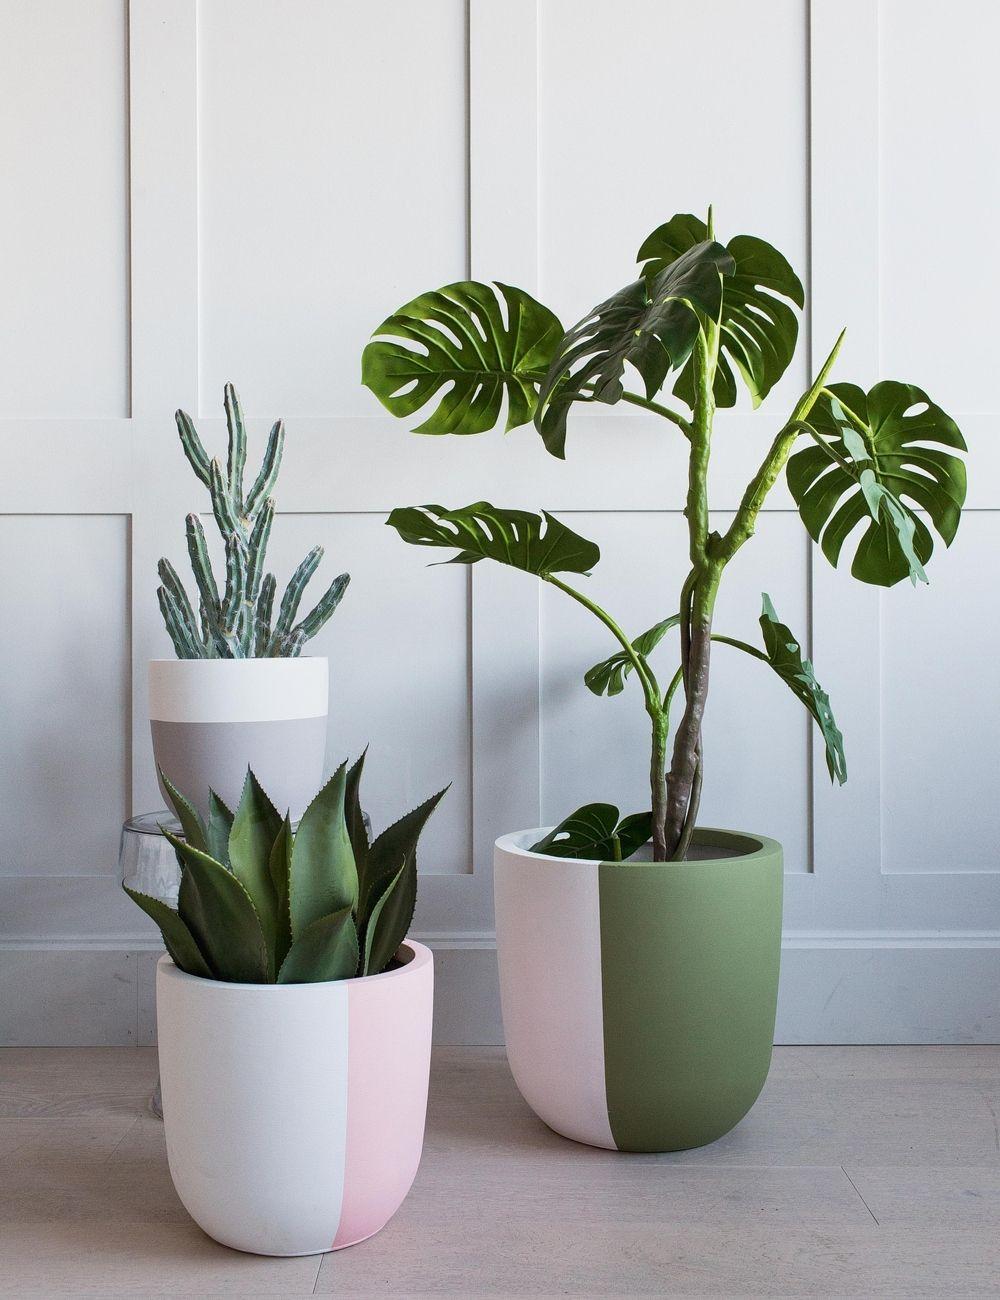 Small Dia 27cm X H 26cmmedium Dia 34cm X H 33cmlarge Dia 43cm X H 42cmhand Painted In The Uk Made Clay Plant Pots House Plants Decor Plant Pot Diy